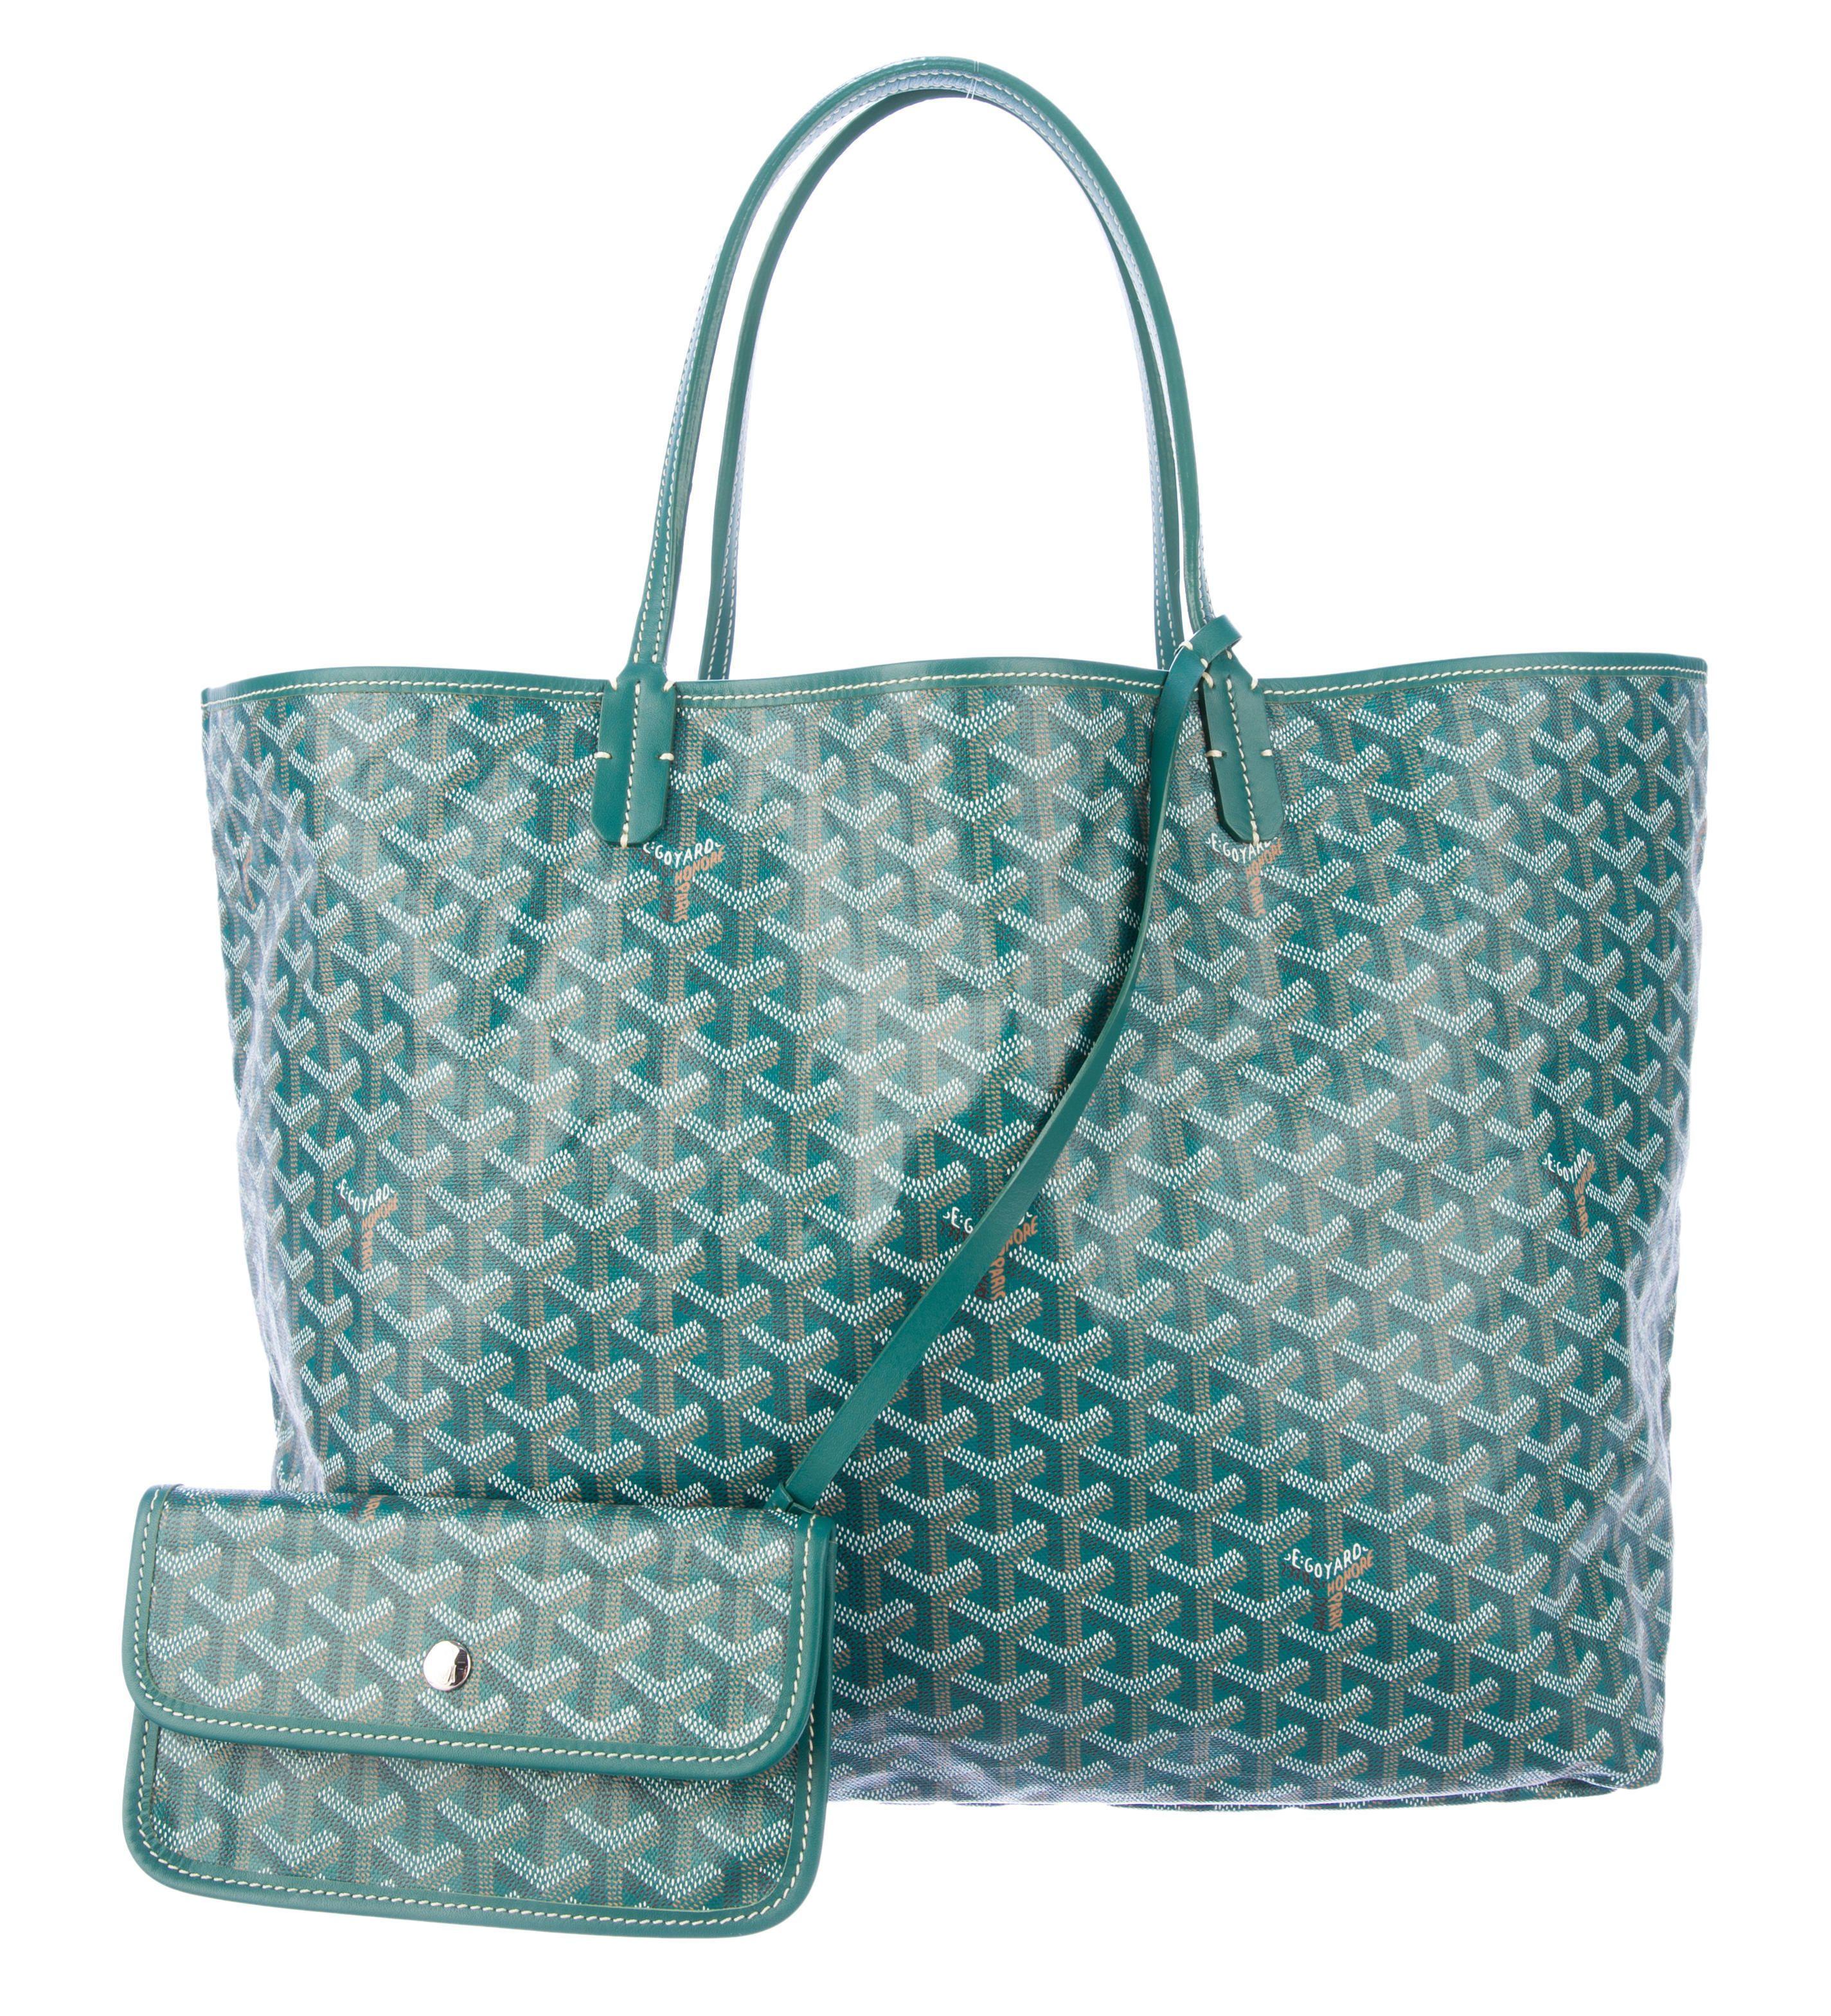 carry it all the best designer tote bags pursebop. Black Bedroom Furniture Sets. Home Design Ideas